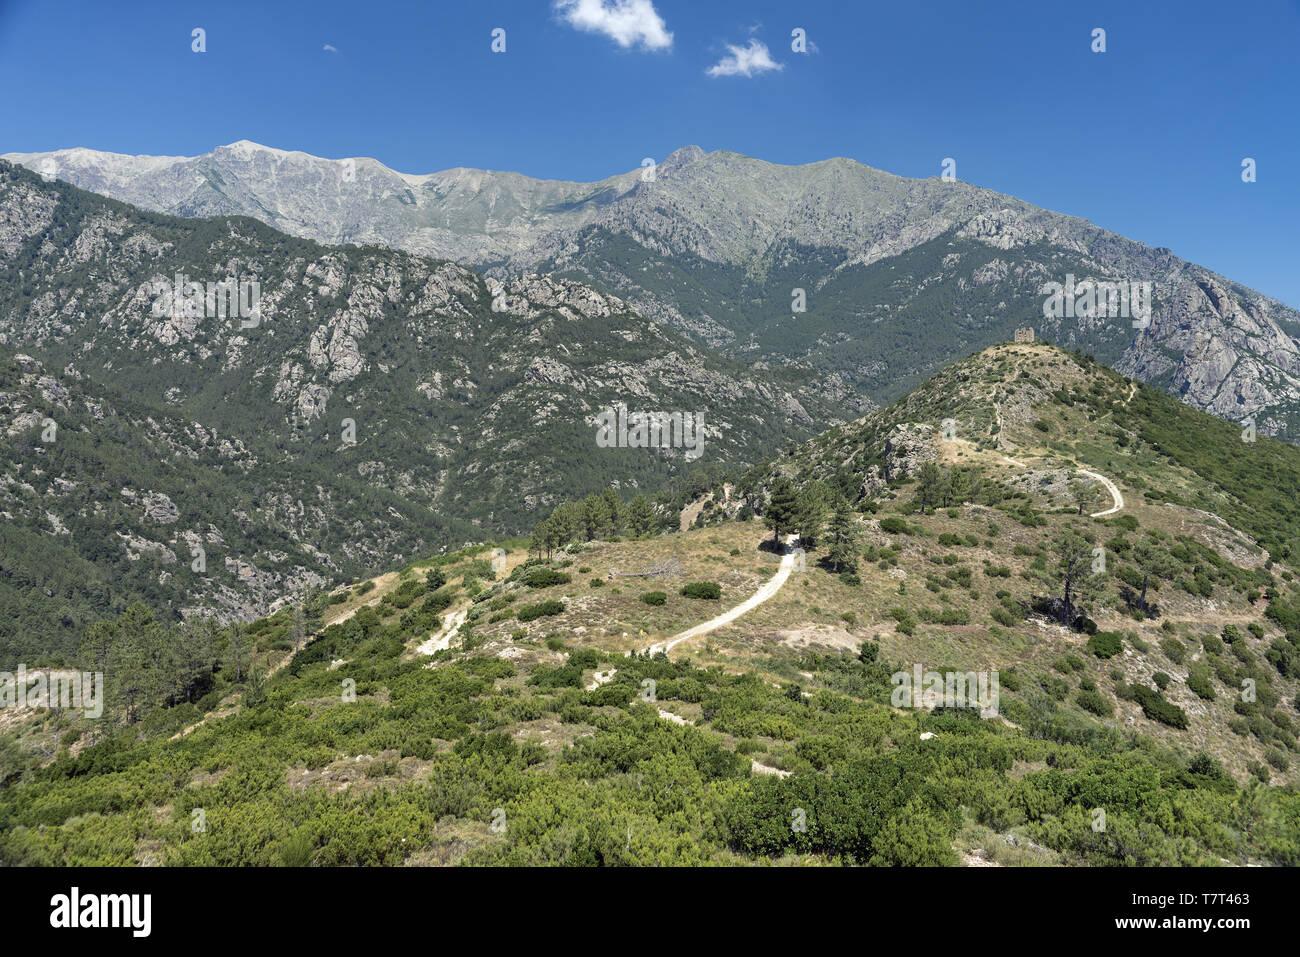 Ruins of a fortress in the Corsican mountains. Ruinen einer Festung in den korsischen Bergen. Ruiny twierdzy w górach Korsyki. - Stock Image